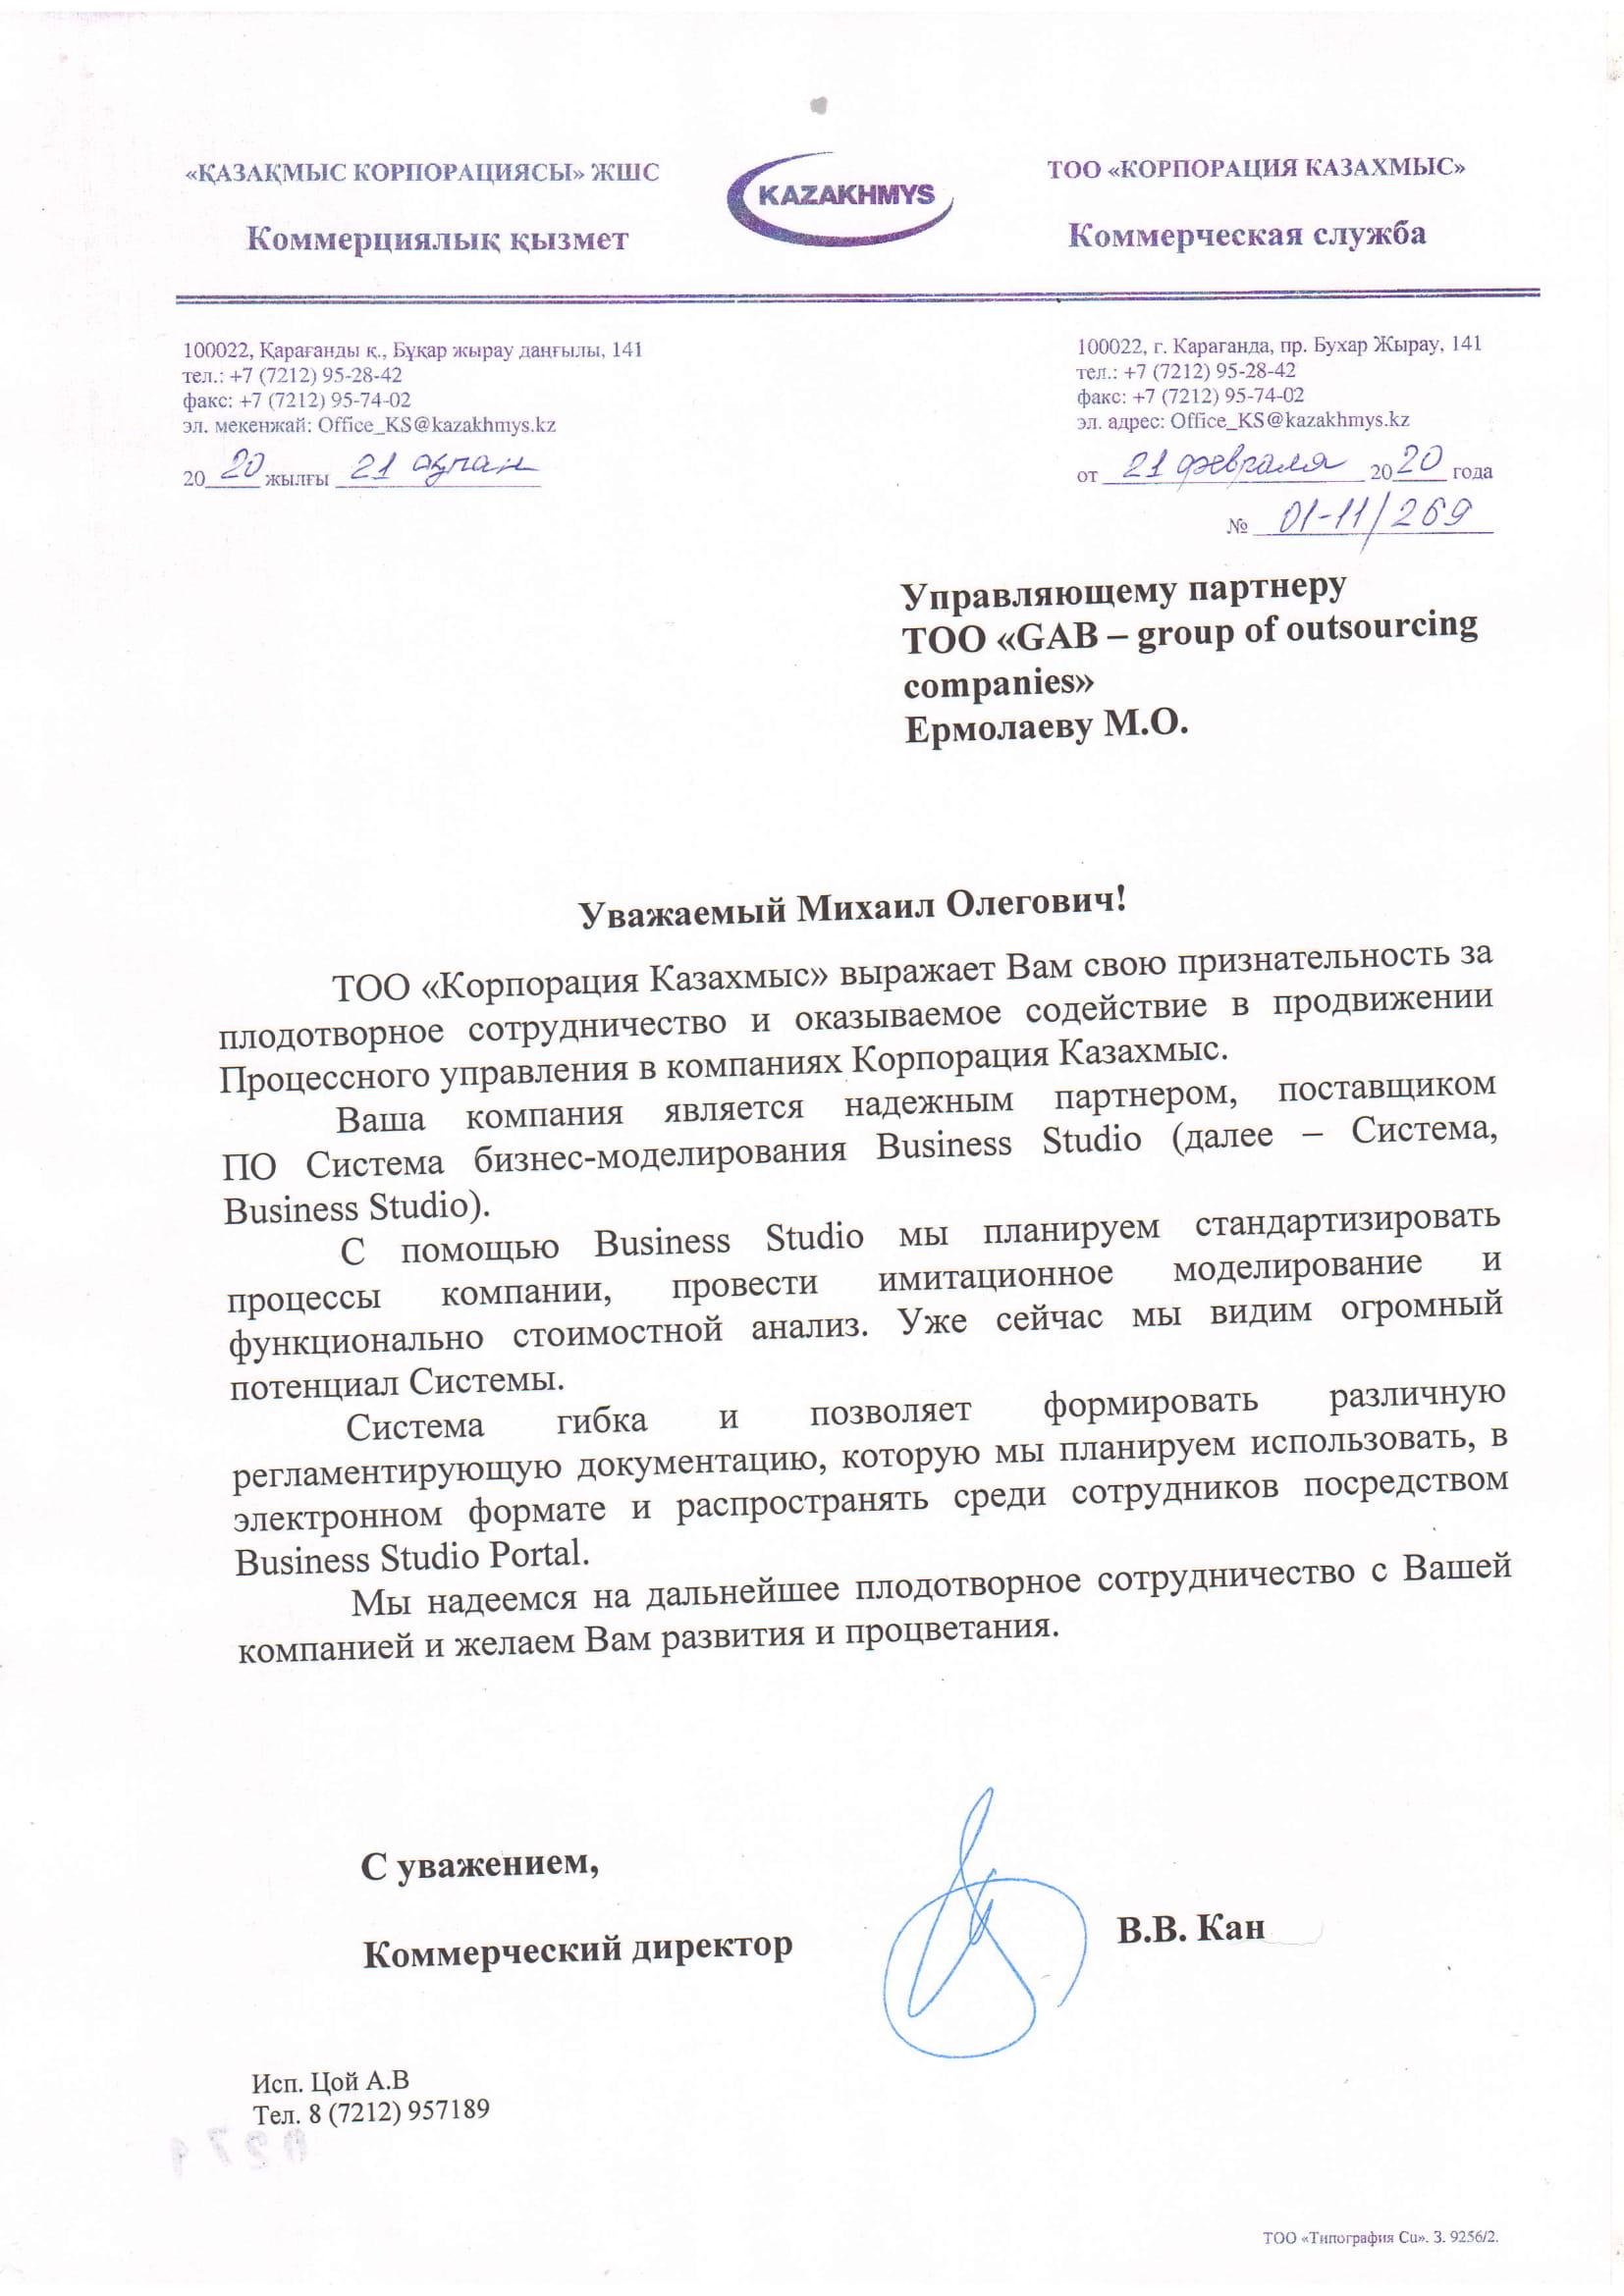 BS-ТОО-Корпорация-Казахмыс